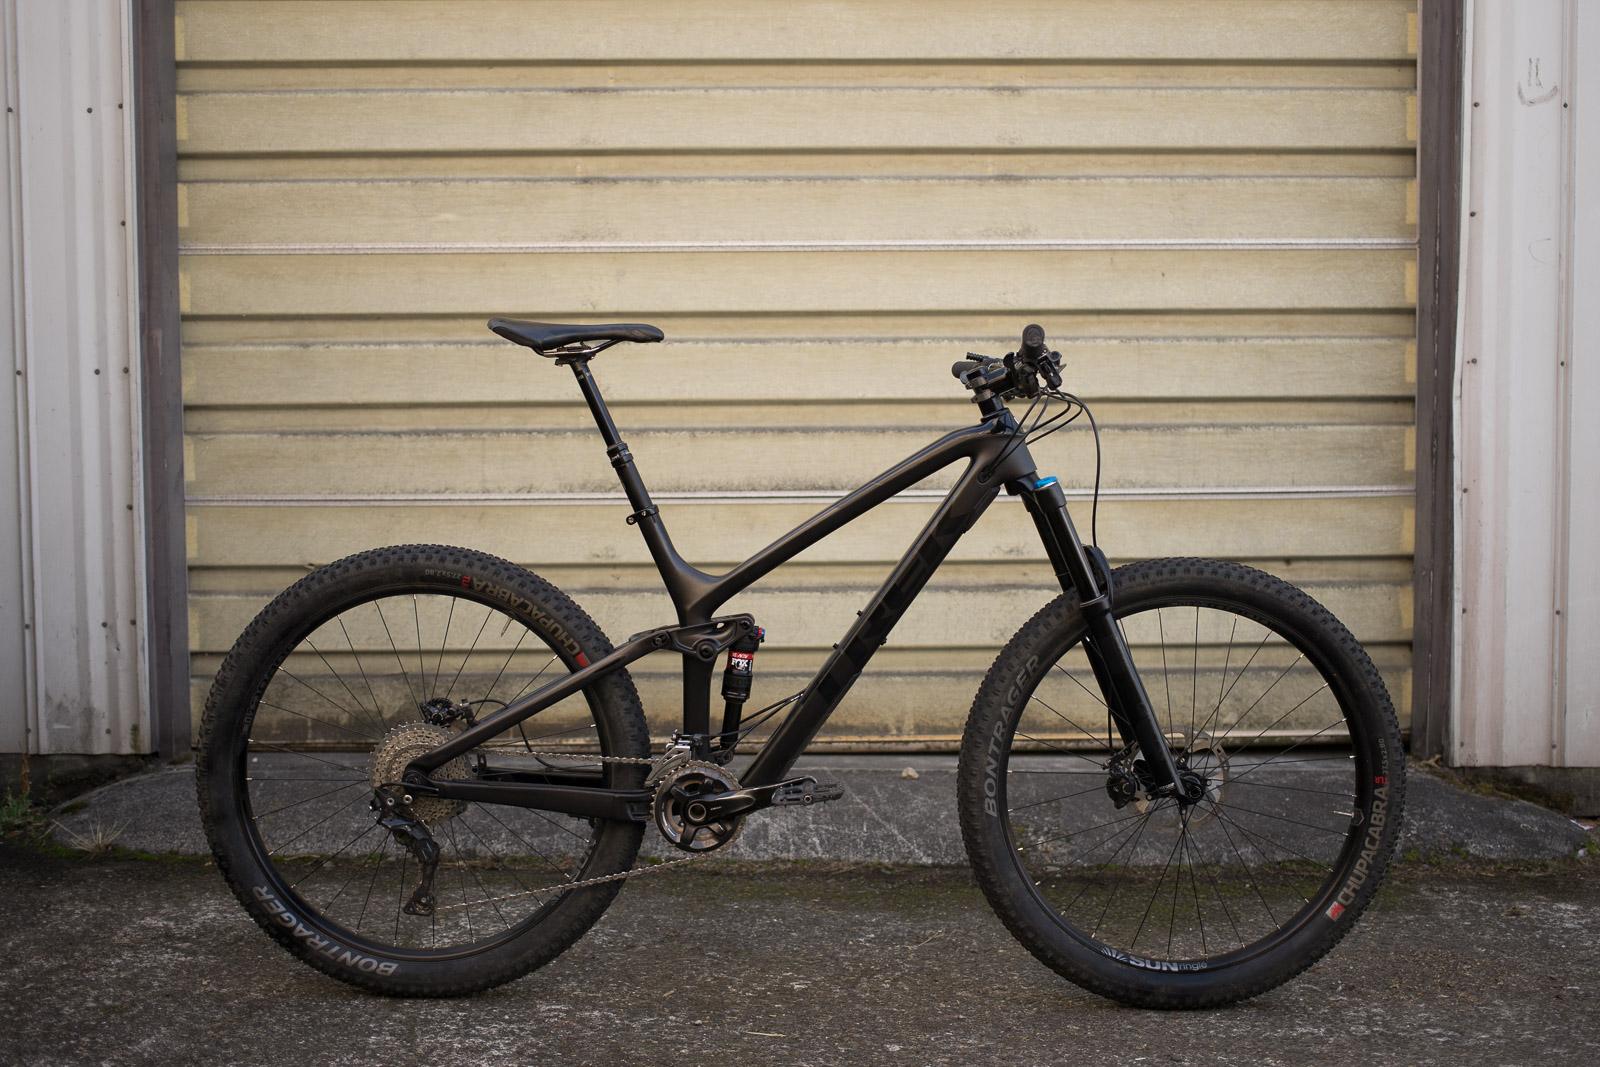 2017 trek fuel ex 9 8 bike review